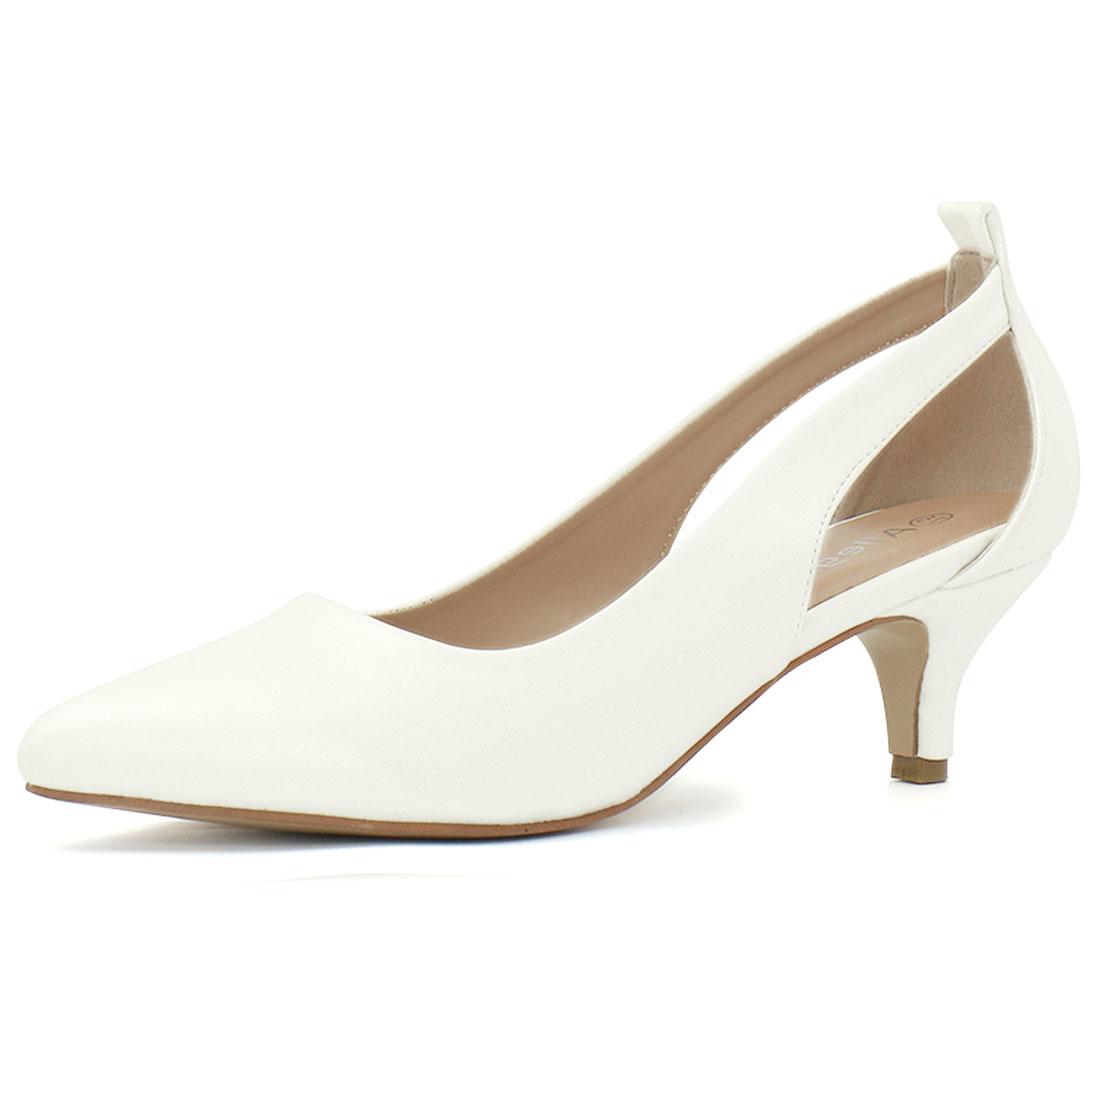 Allegra K Women's Cutout Sides Pointed Toe Kitten Heel Pumps White US 10.5